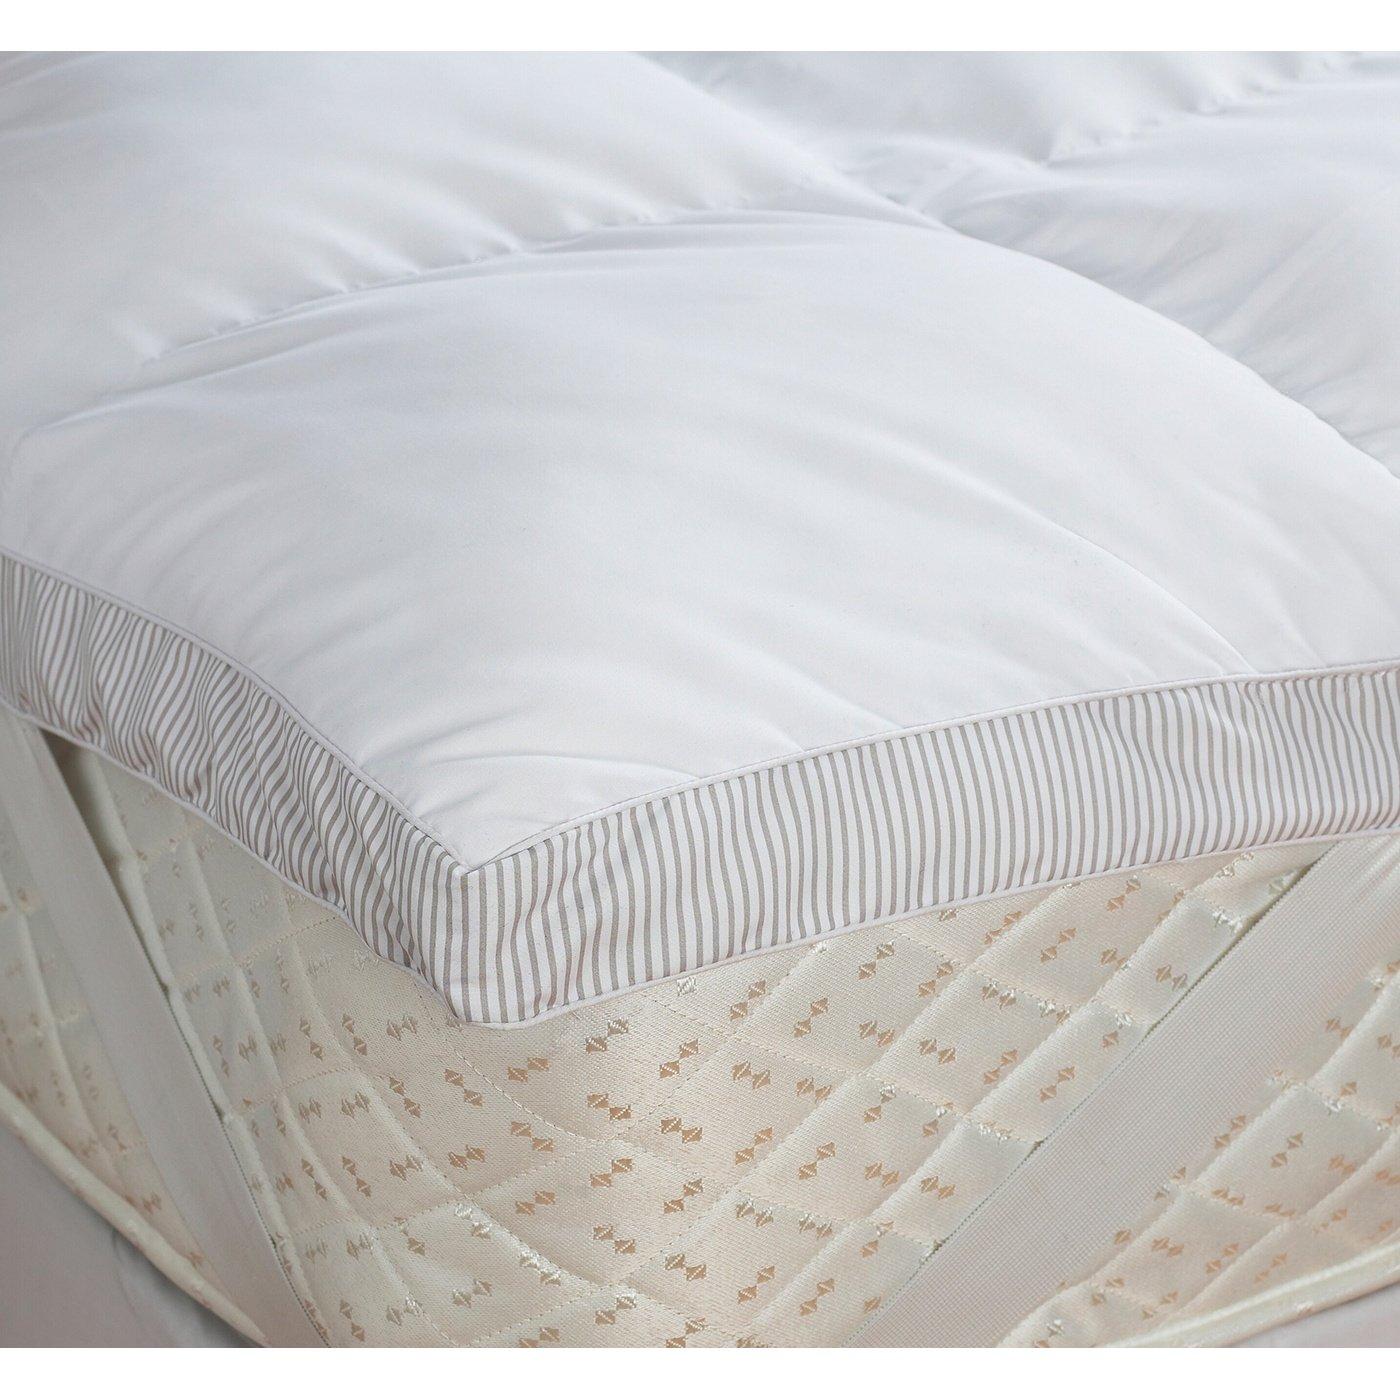 riva paoletti ambassador mattress toppers white king amazoncouk kitchen u0026 home